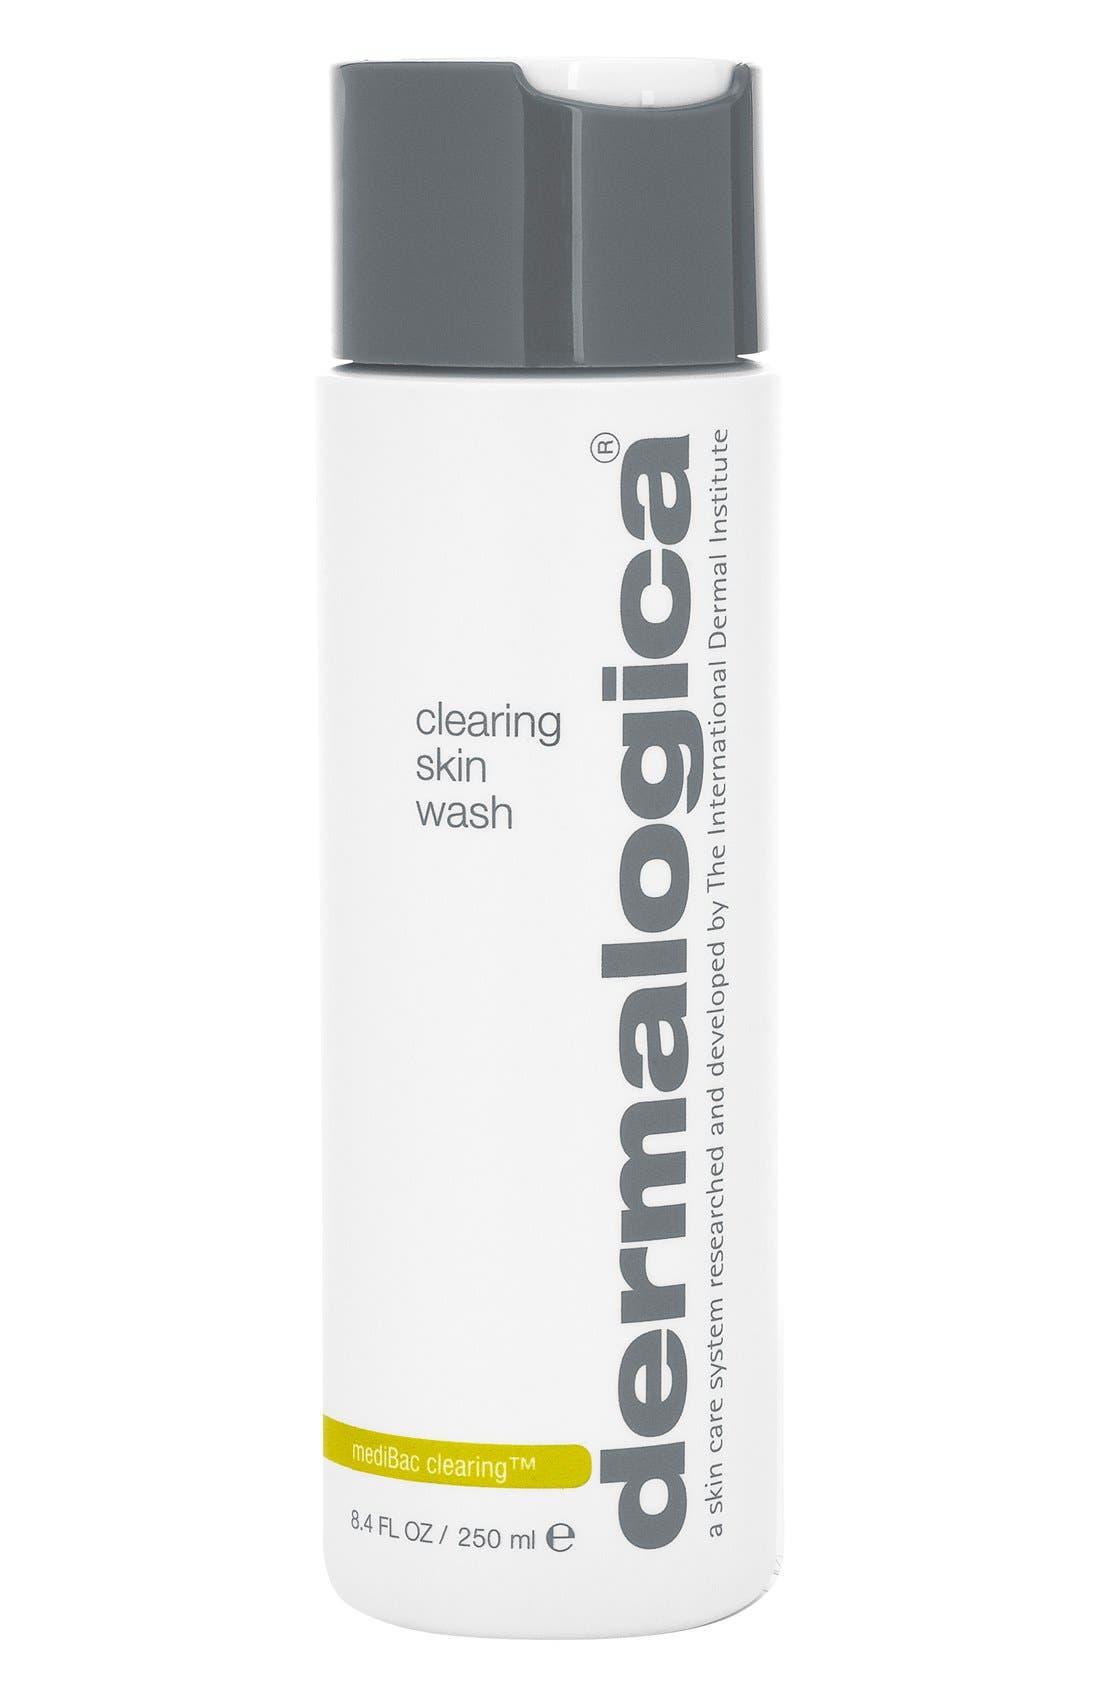 dermalogica® Clearing Skin Wash